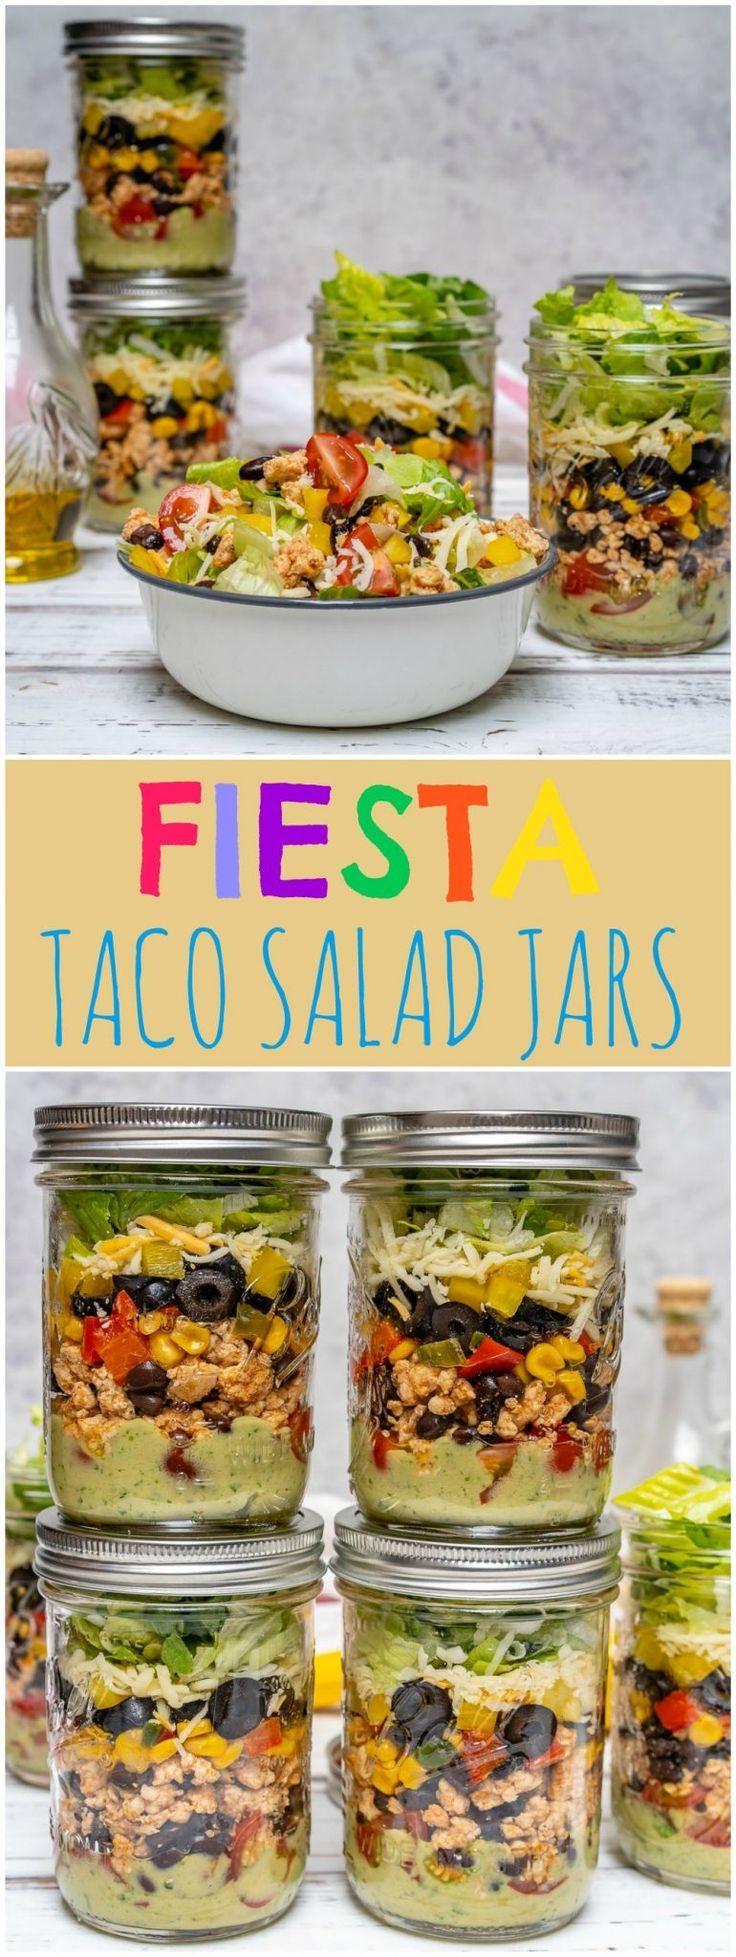 Fiesta Taco Salad-in-a-jar with Creamy Avocado + Cilantro Dressing – 21 Day Fix Recipes